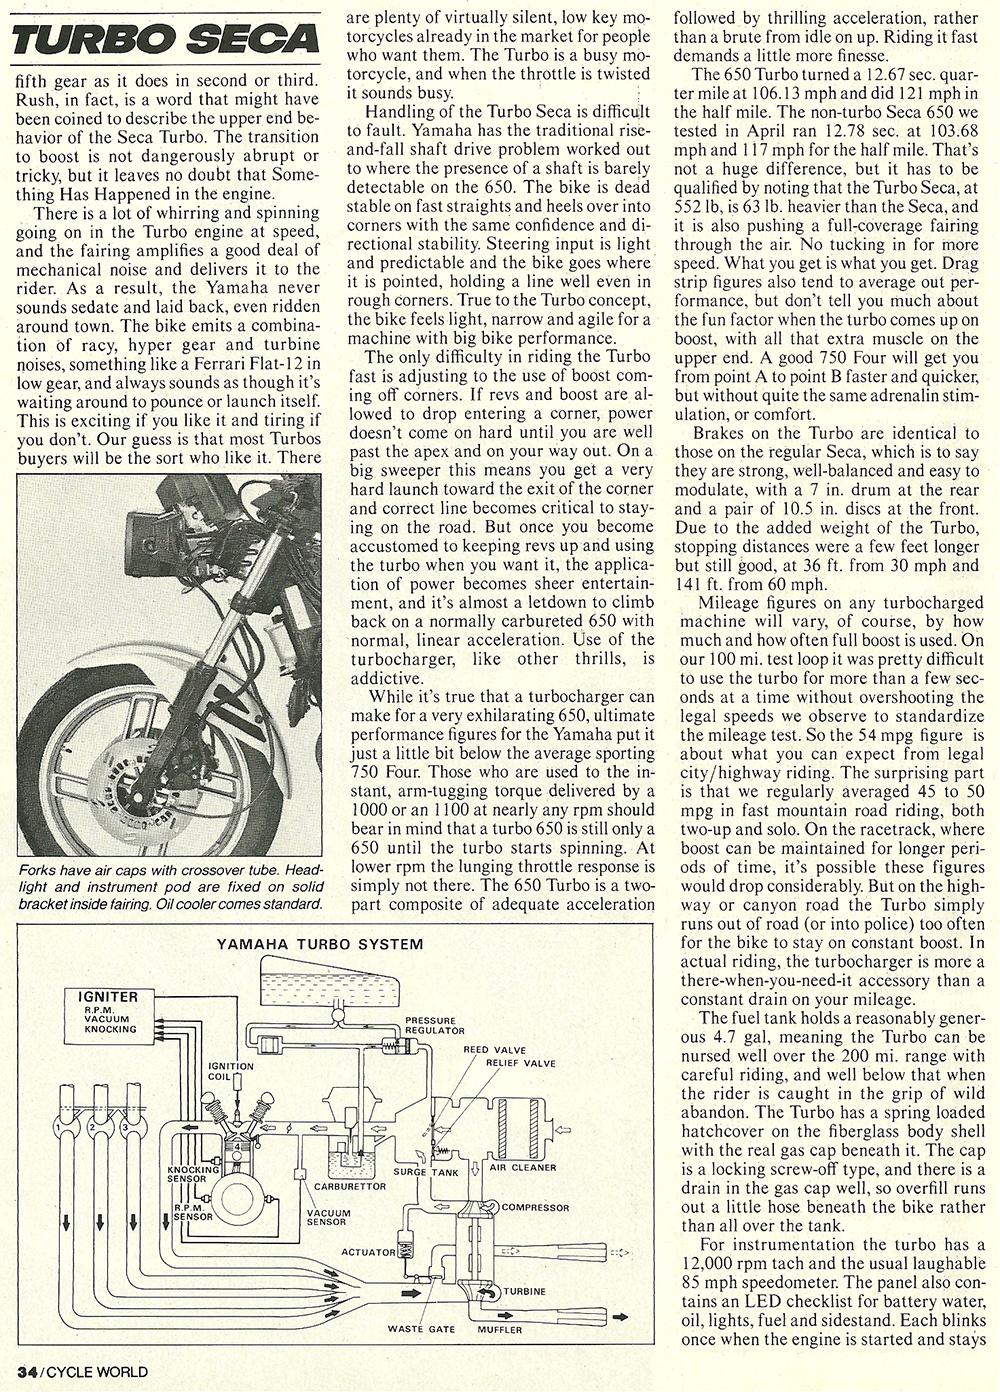 1982 Yamaha Turbo Seca 650 road test 07.jpg